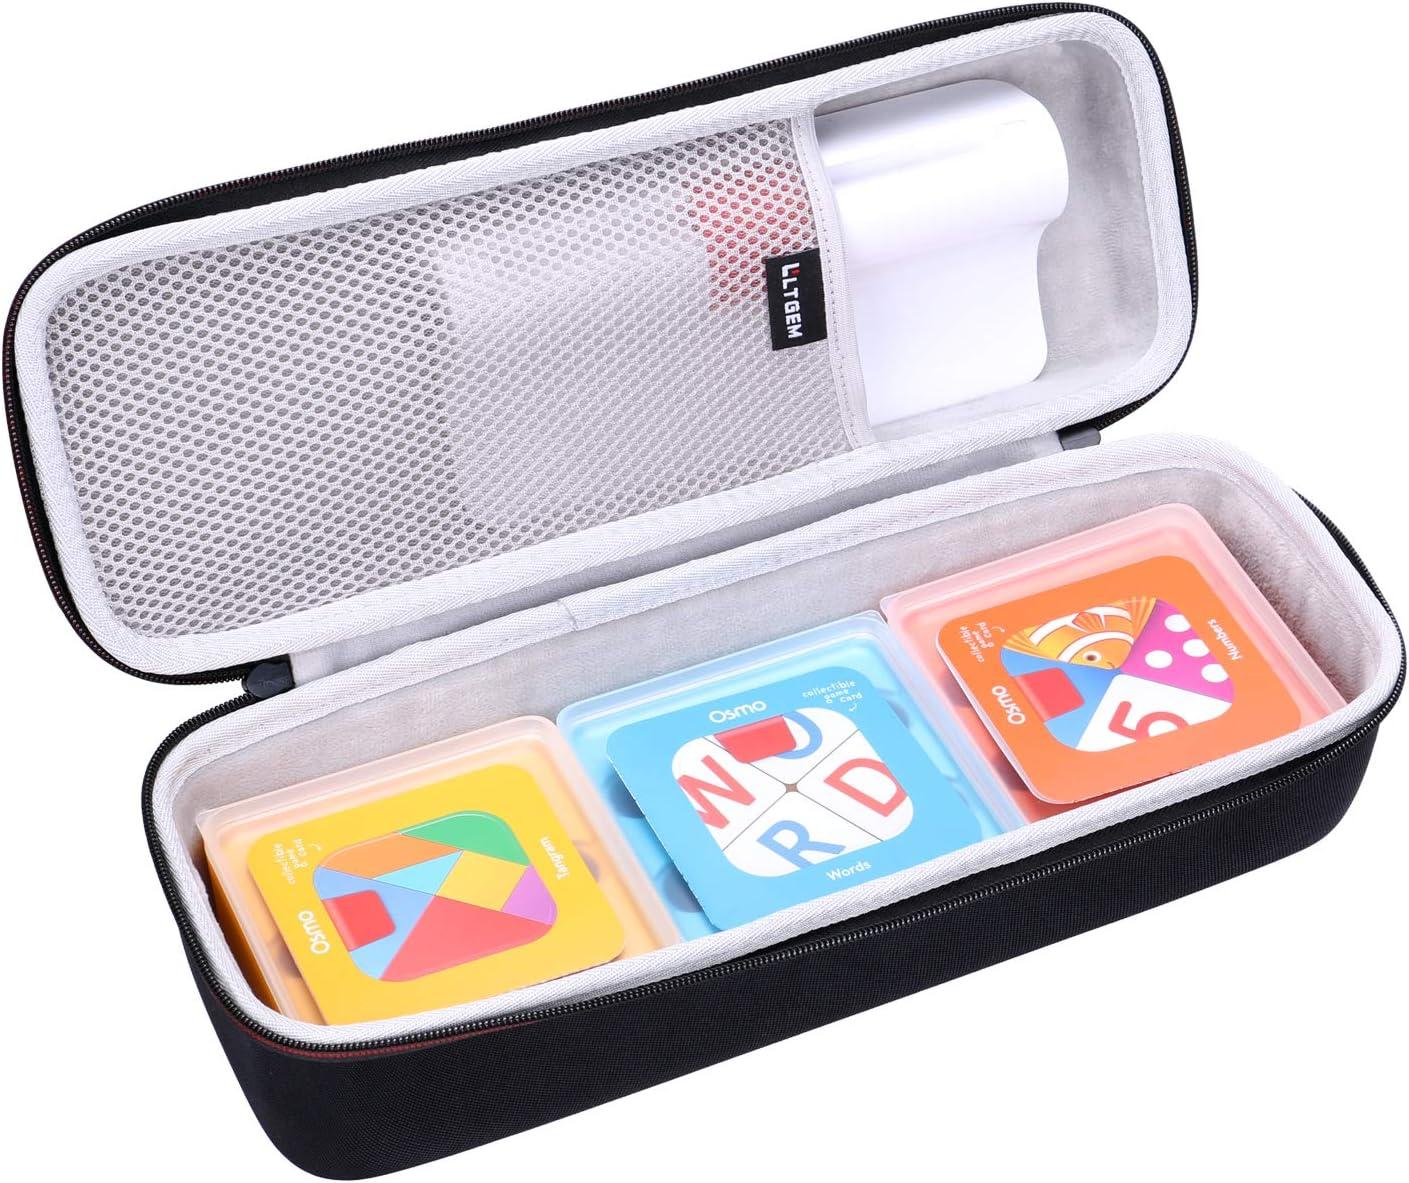 LTGEM EVA Hard Case for Osmo Genius Kit for iPad - Travel Protective Carrying Storage Bag